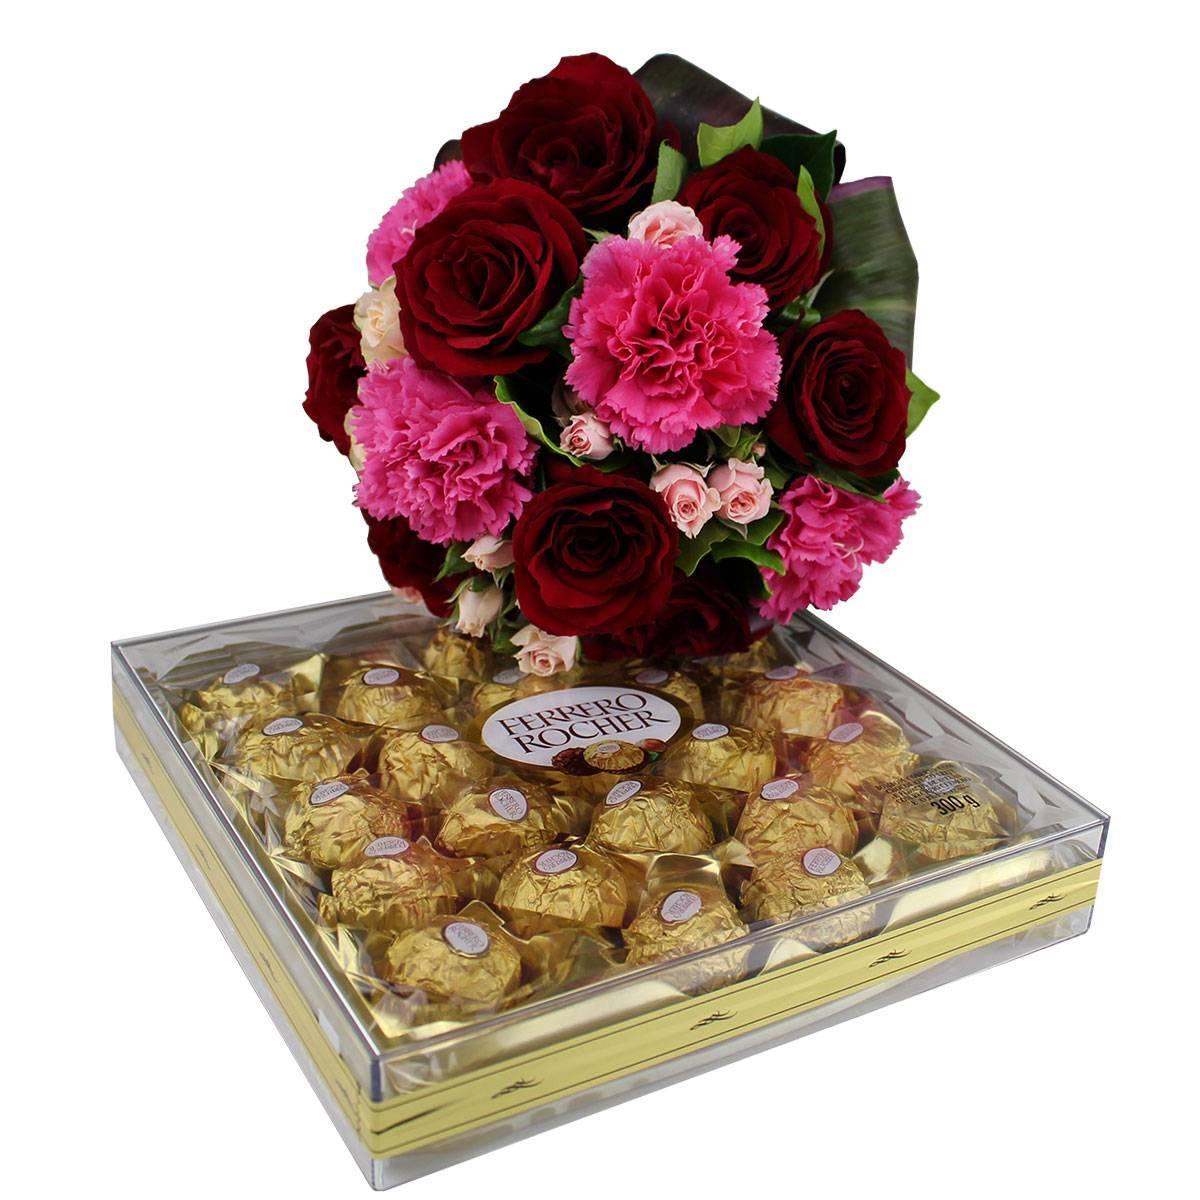 Cravos Eu Te Amo com Ferrero  - Florisbella - Matriz Campinas